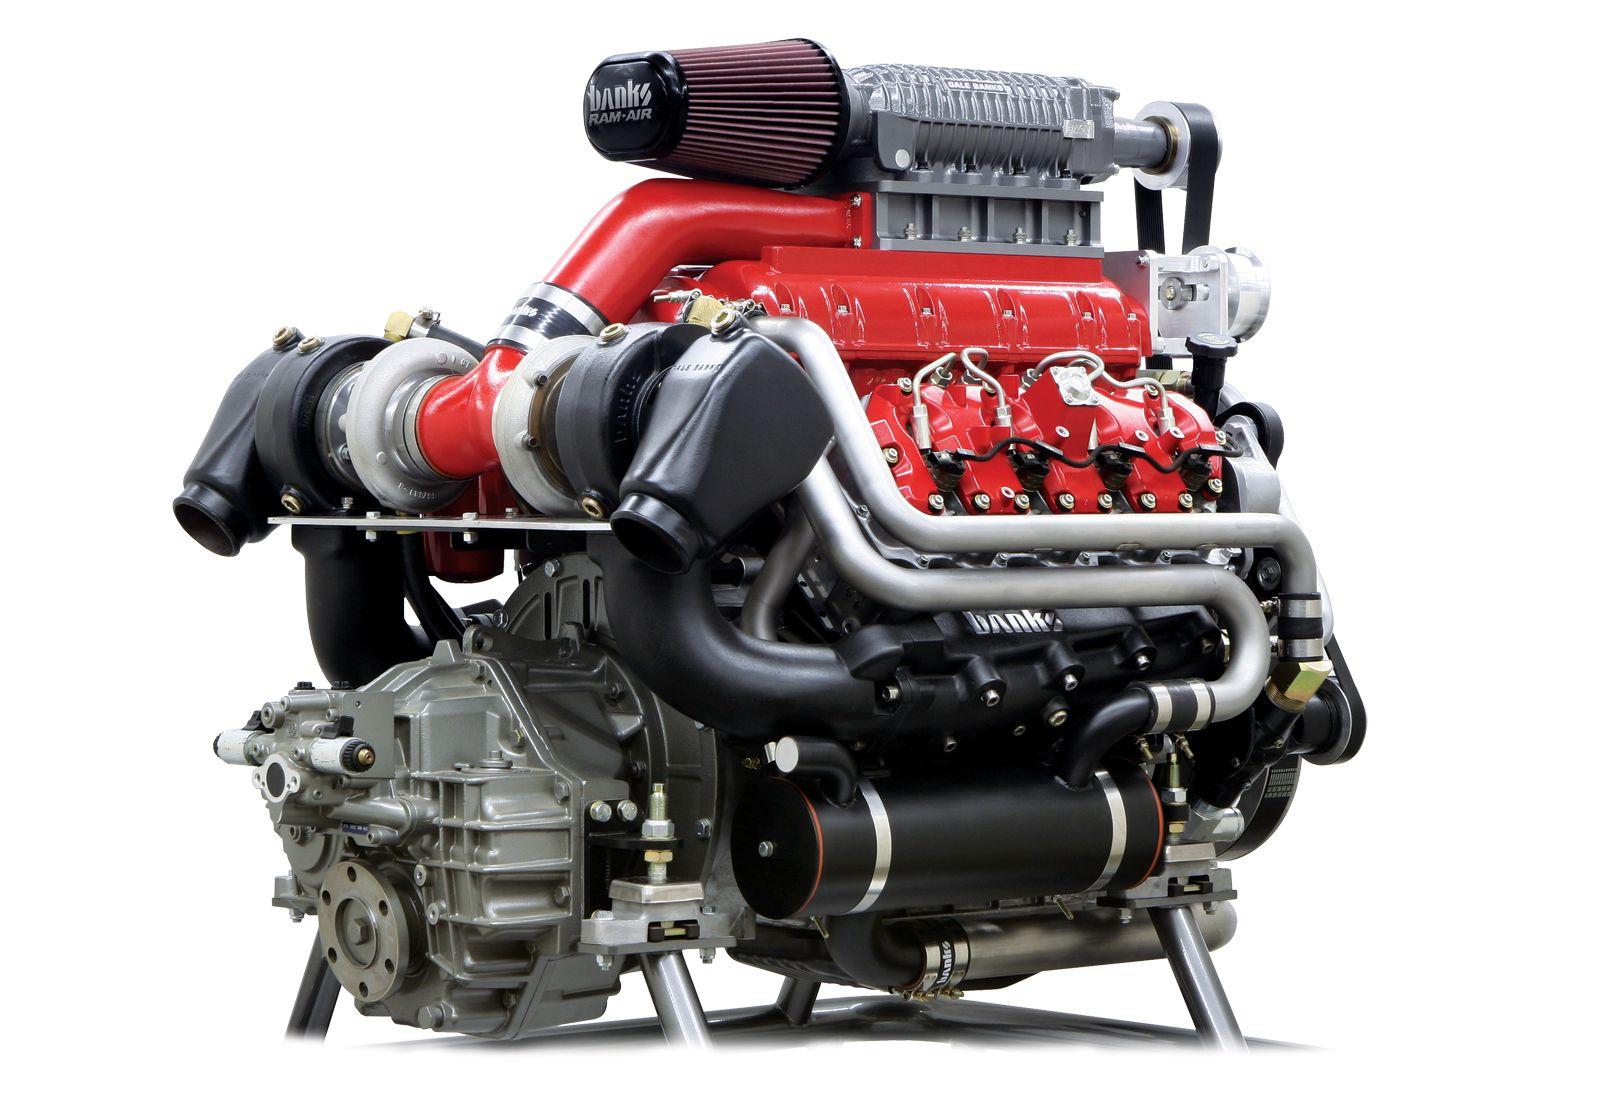 Banks 866T Banks Power Banks Super-Turbo Marine Diesel Diesel Duramax  Magazine Articles Marine